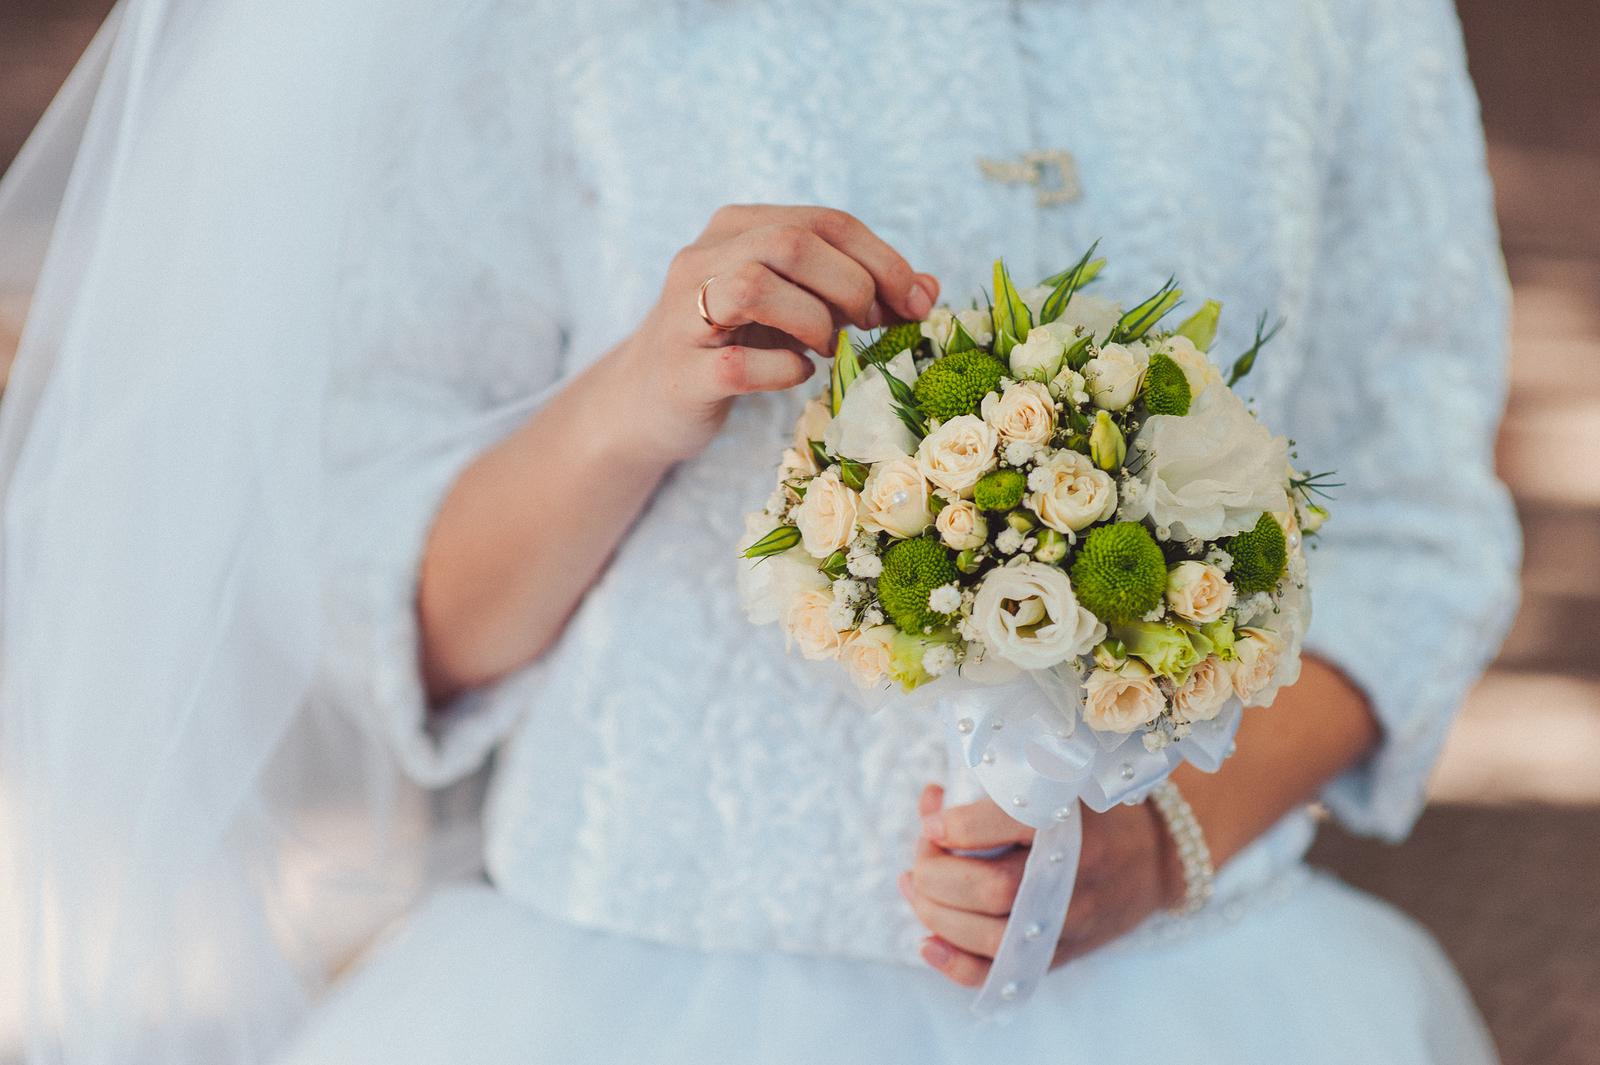 bigstock-Bride-Holding-Big-Wedding-Bouq-195104521.jpg